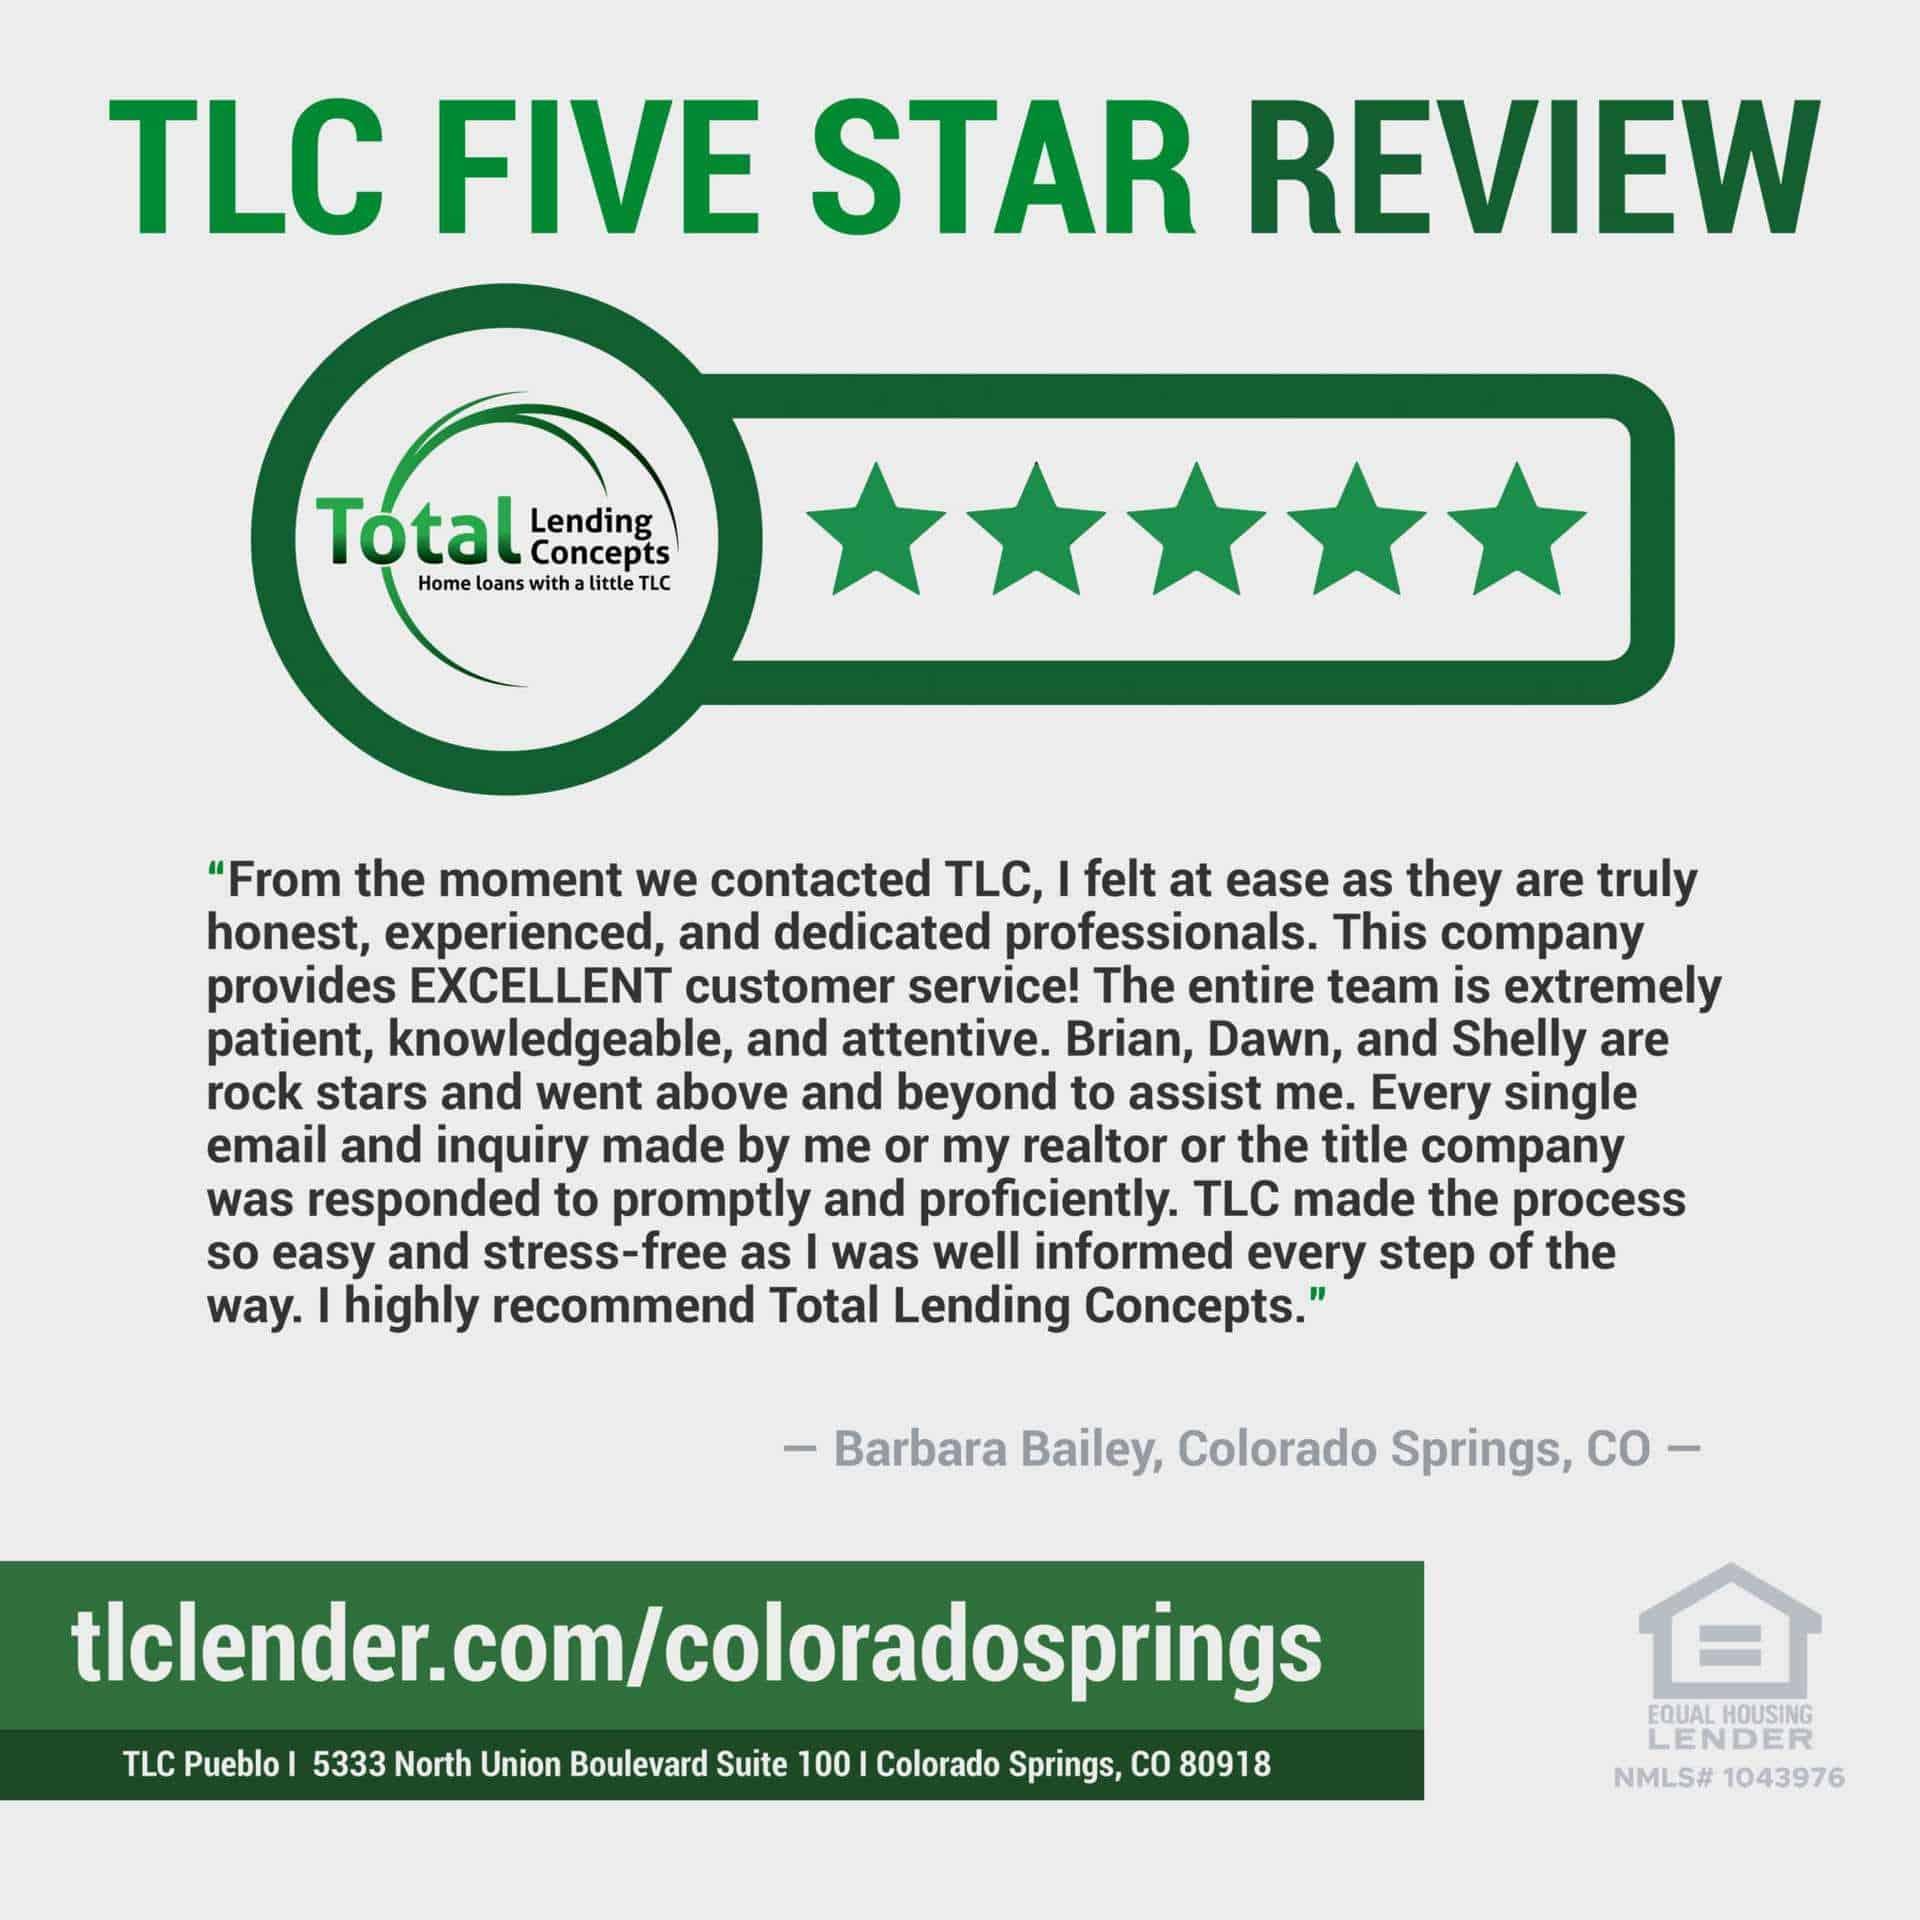 Total Lending Concepts Five Star Review Barbara Bailey Colorado Springs Colorado for Brian,Dawn,Shelly House Loan